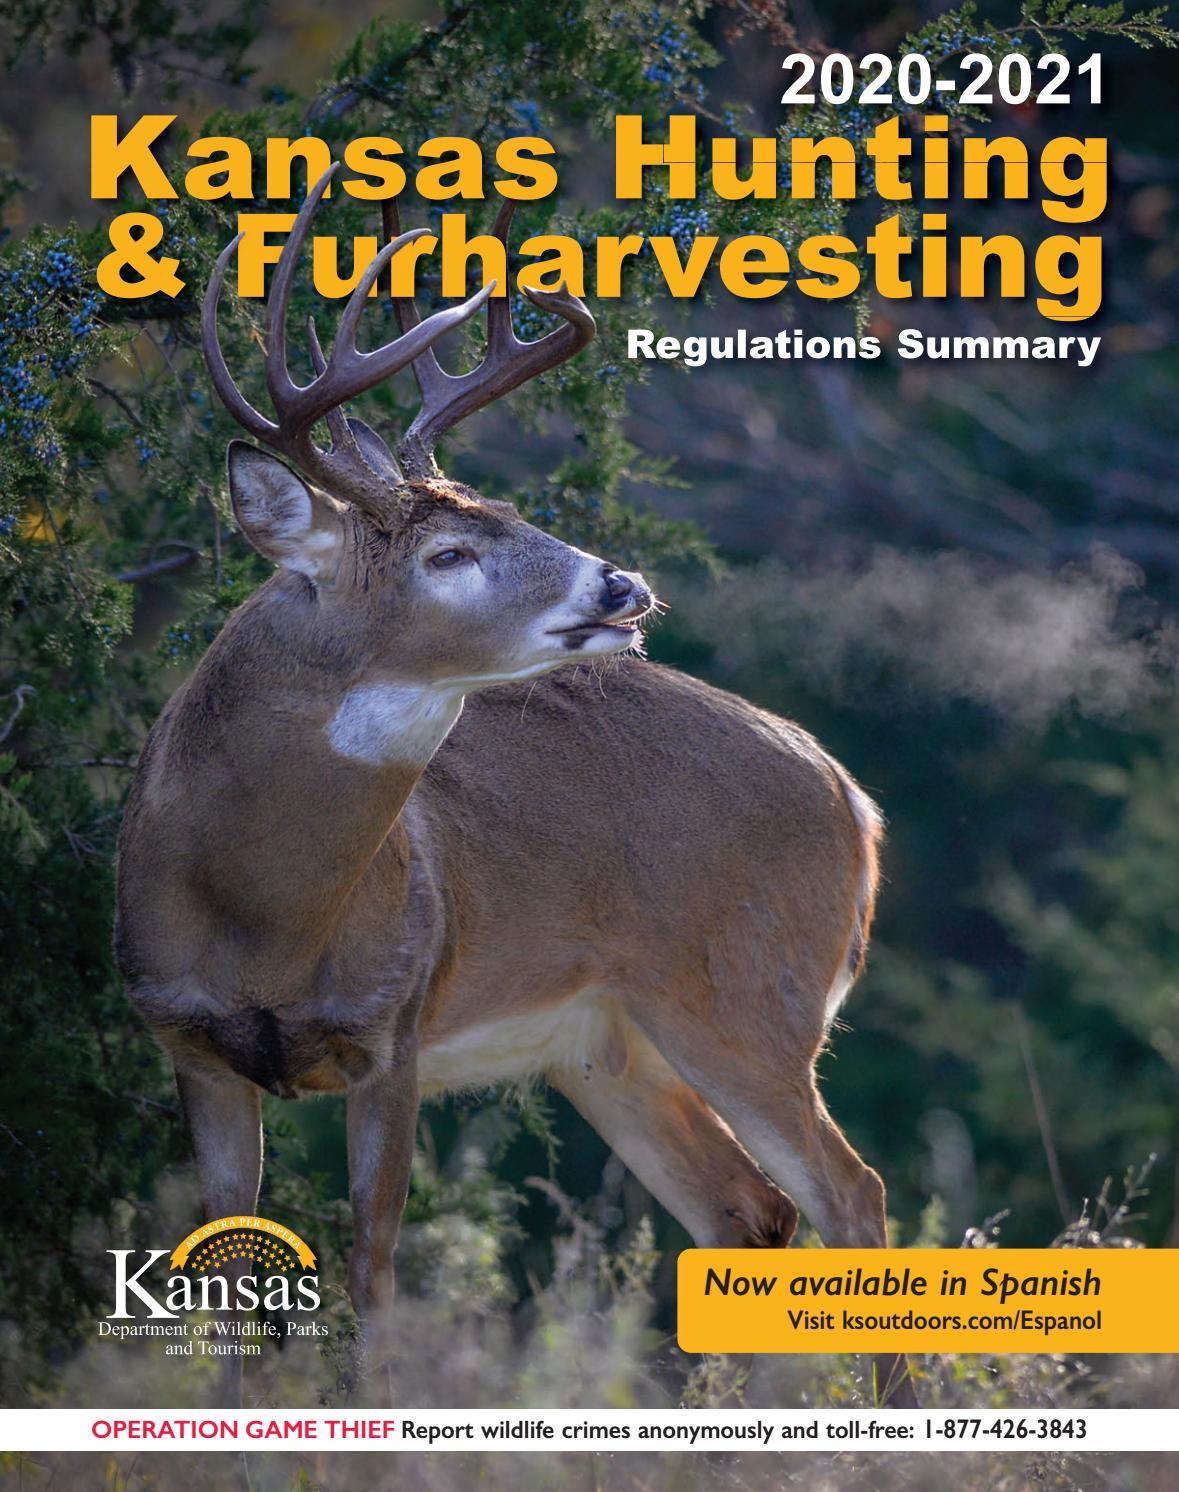 2021 Whitetail Deer Rut Predictions | Calendar Template throughout Pa Rut Forecast 2021